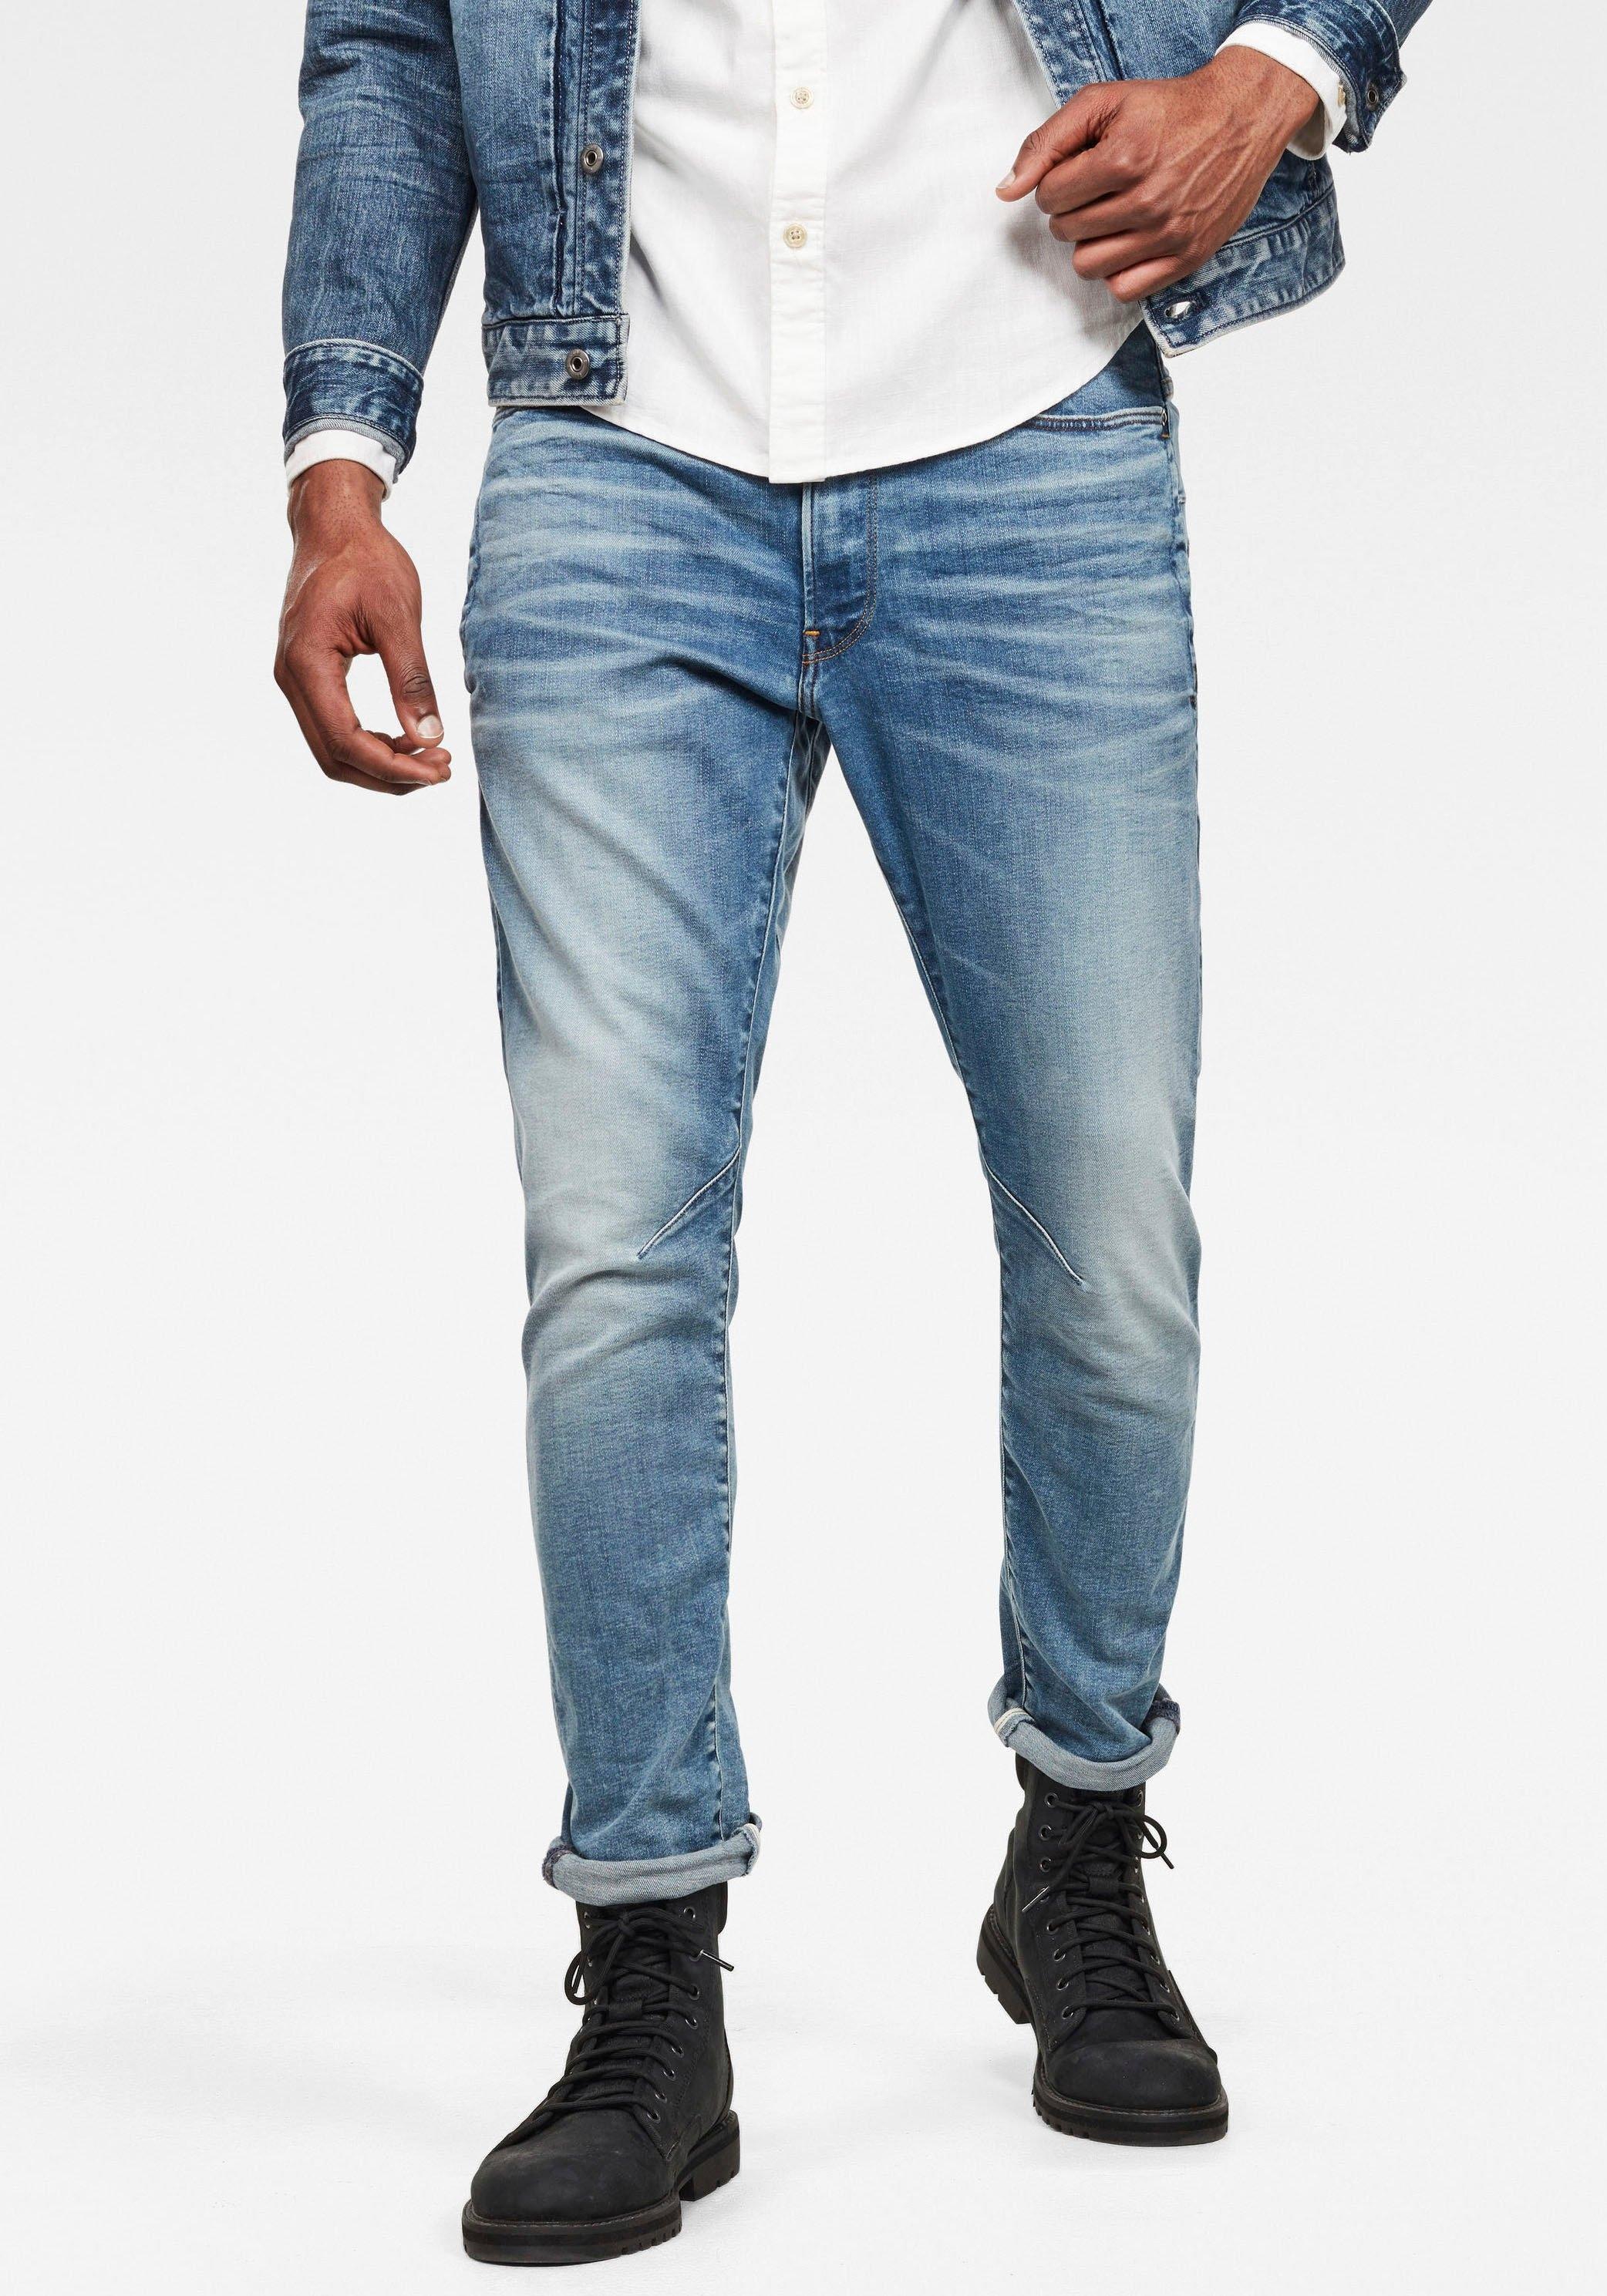 G-Star RAW slim fit jeans D-Staq 3D Slim Fit bestellen: 30 dagen bedenktijd